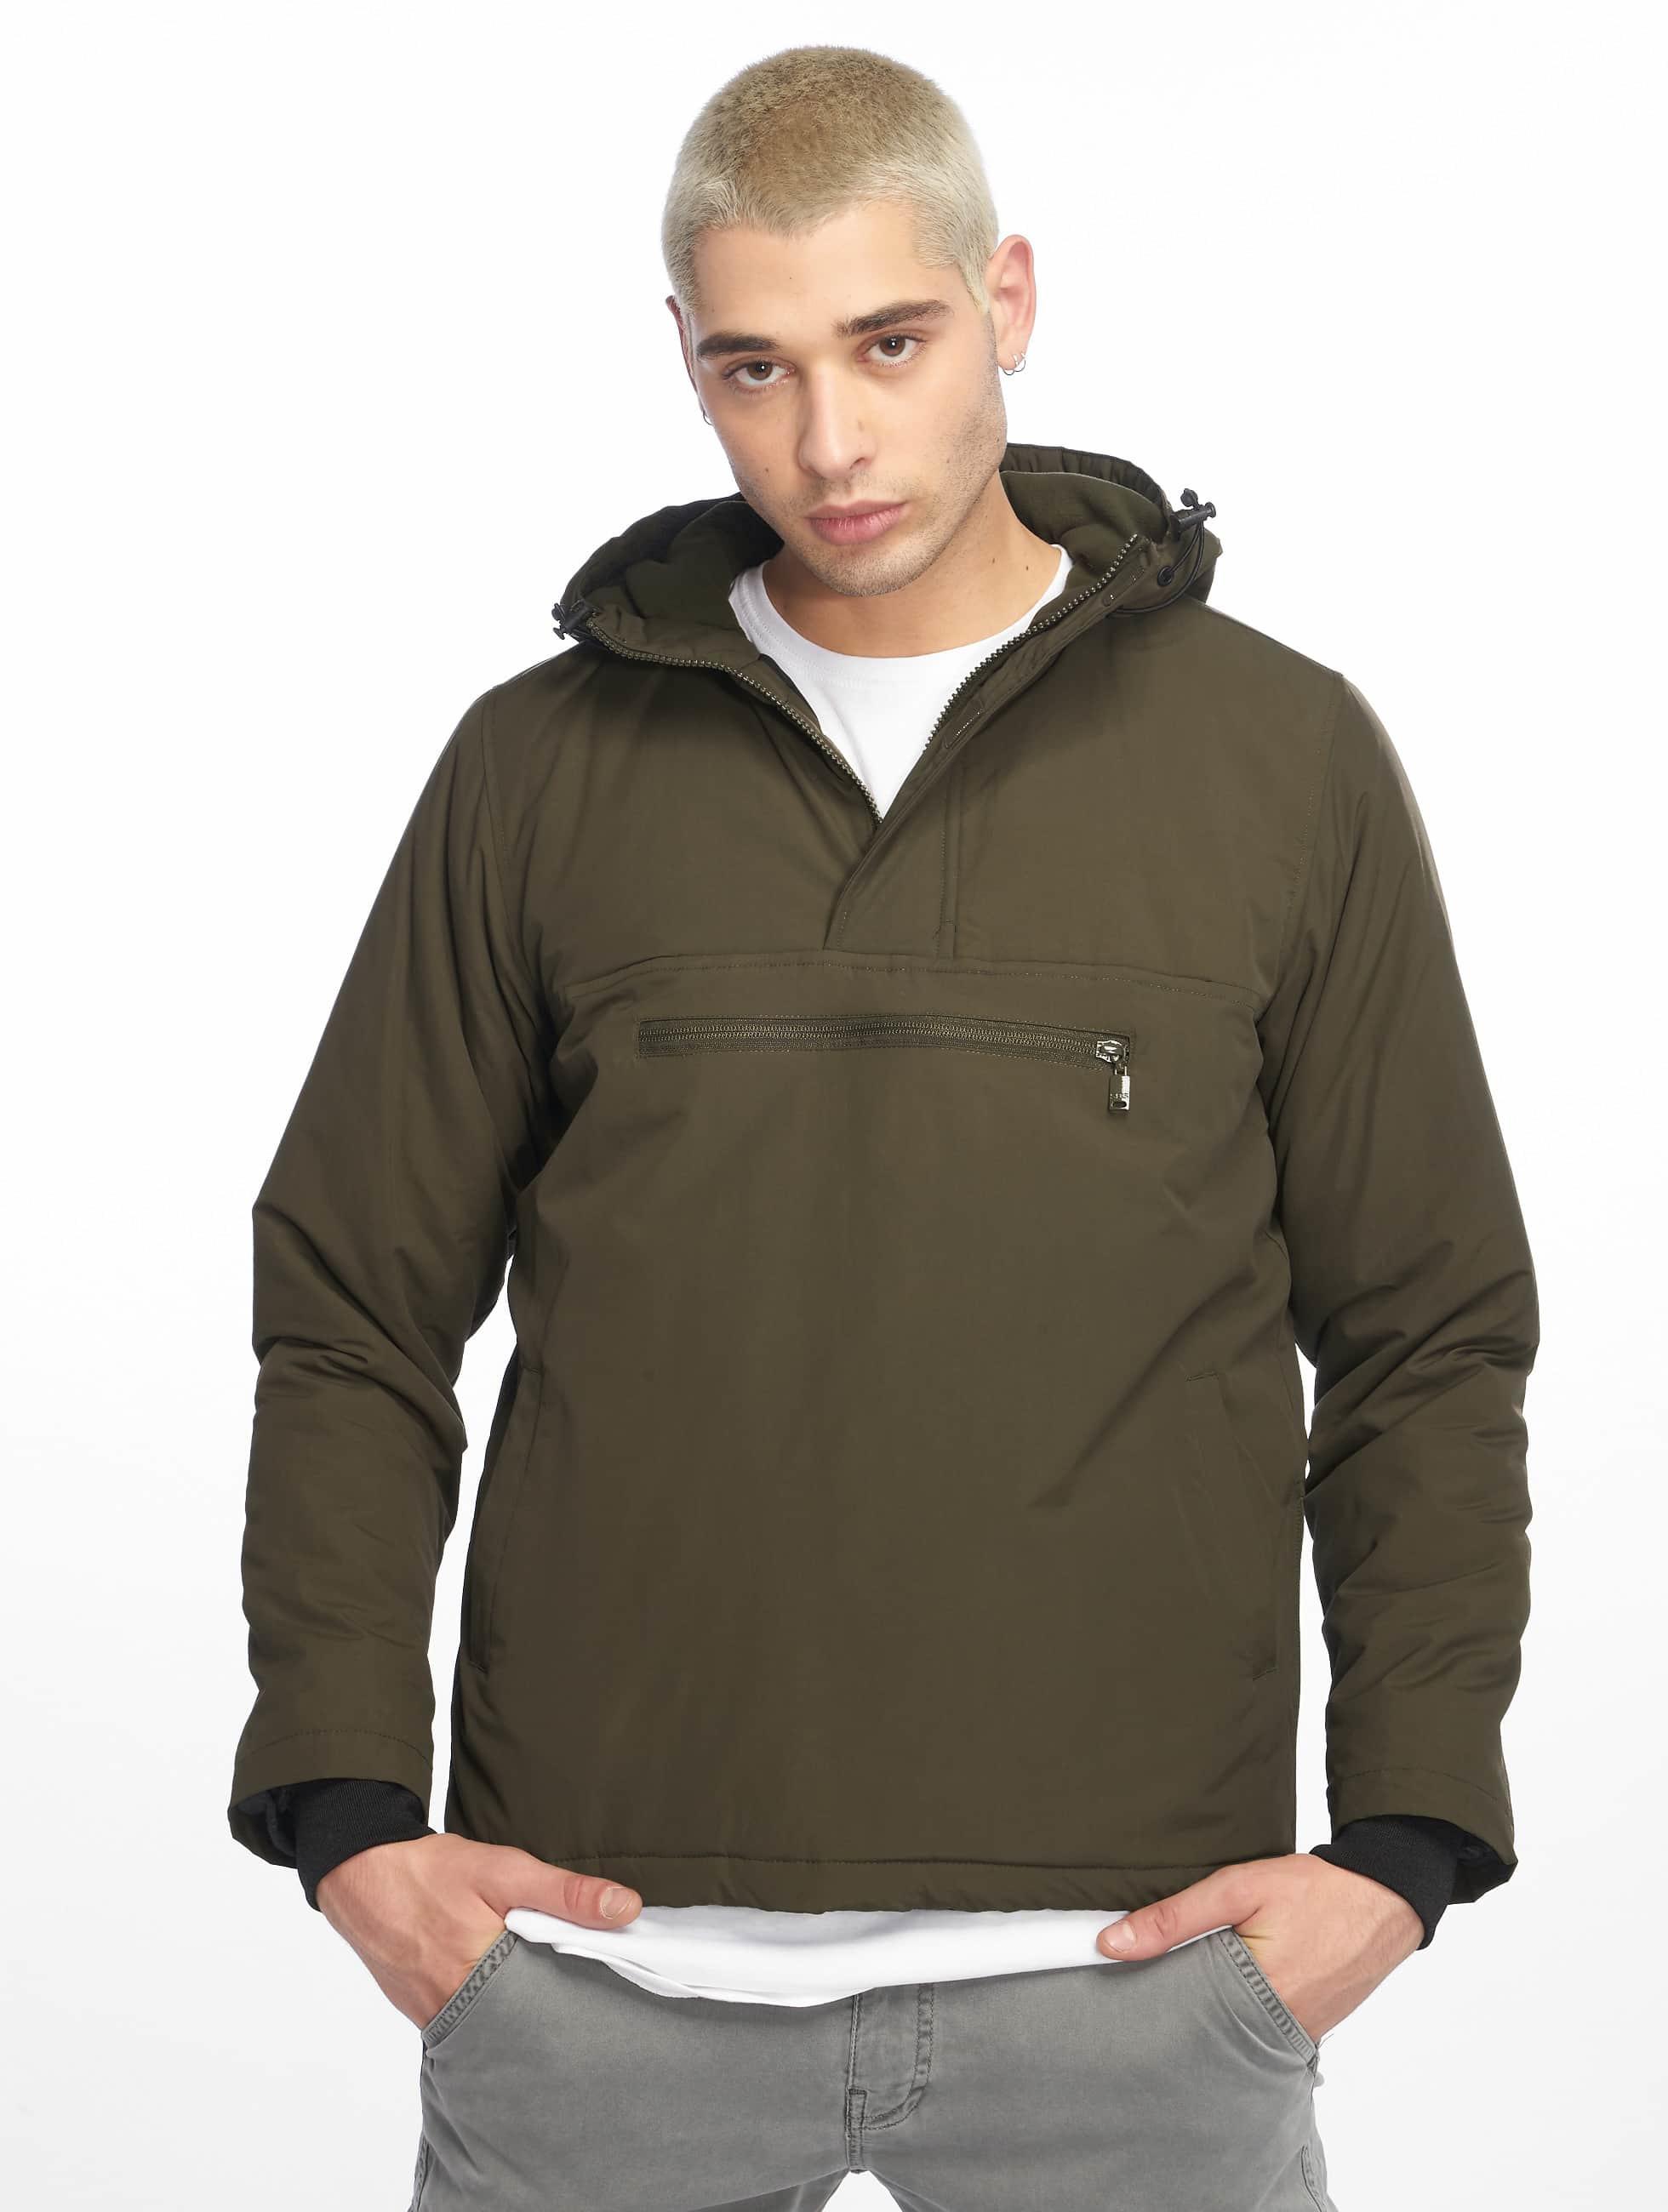 Urban Classics Демисезонная куртка Padded Pull оливковый